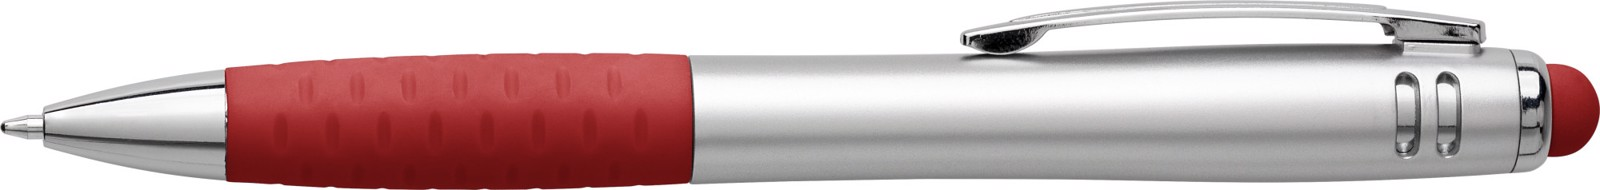 Multifunctional twist-action plastic ballpoint pen - Red